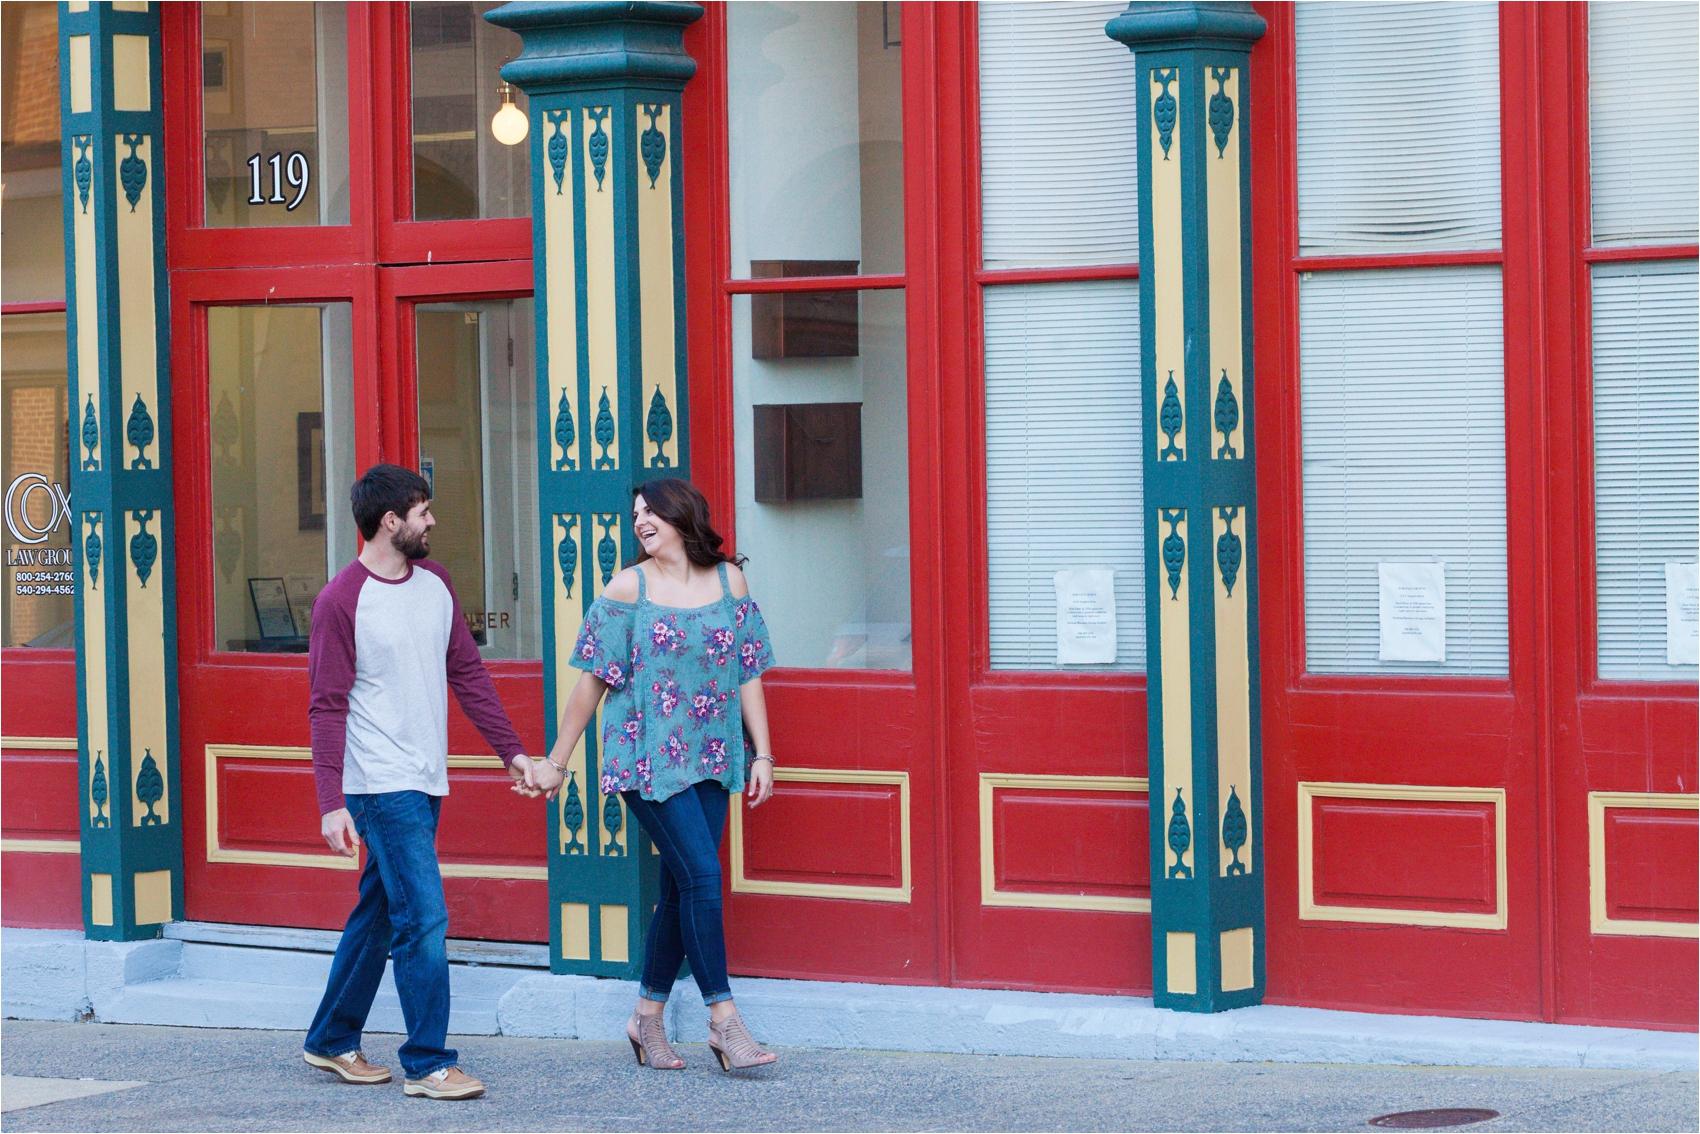 Downtown-Staunton-VA-Spring-Engagement-Session-2970.jpg